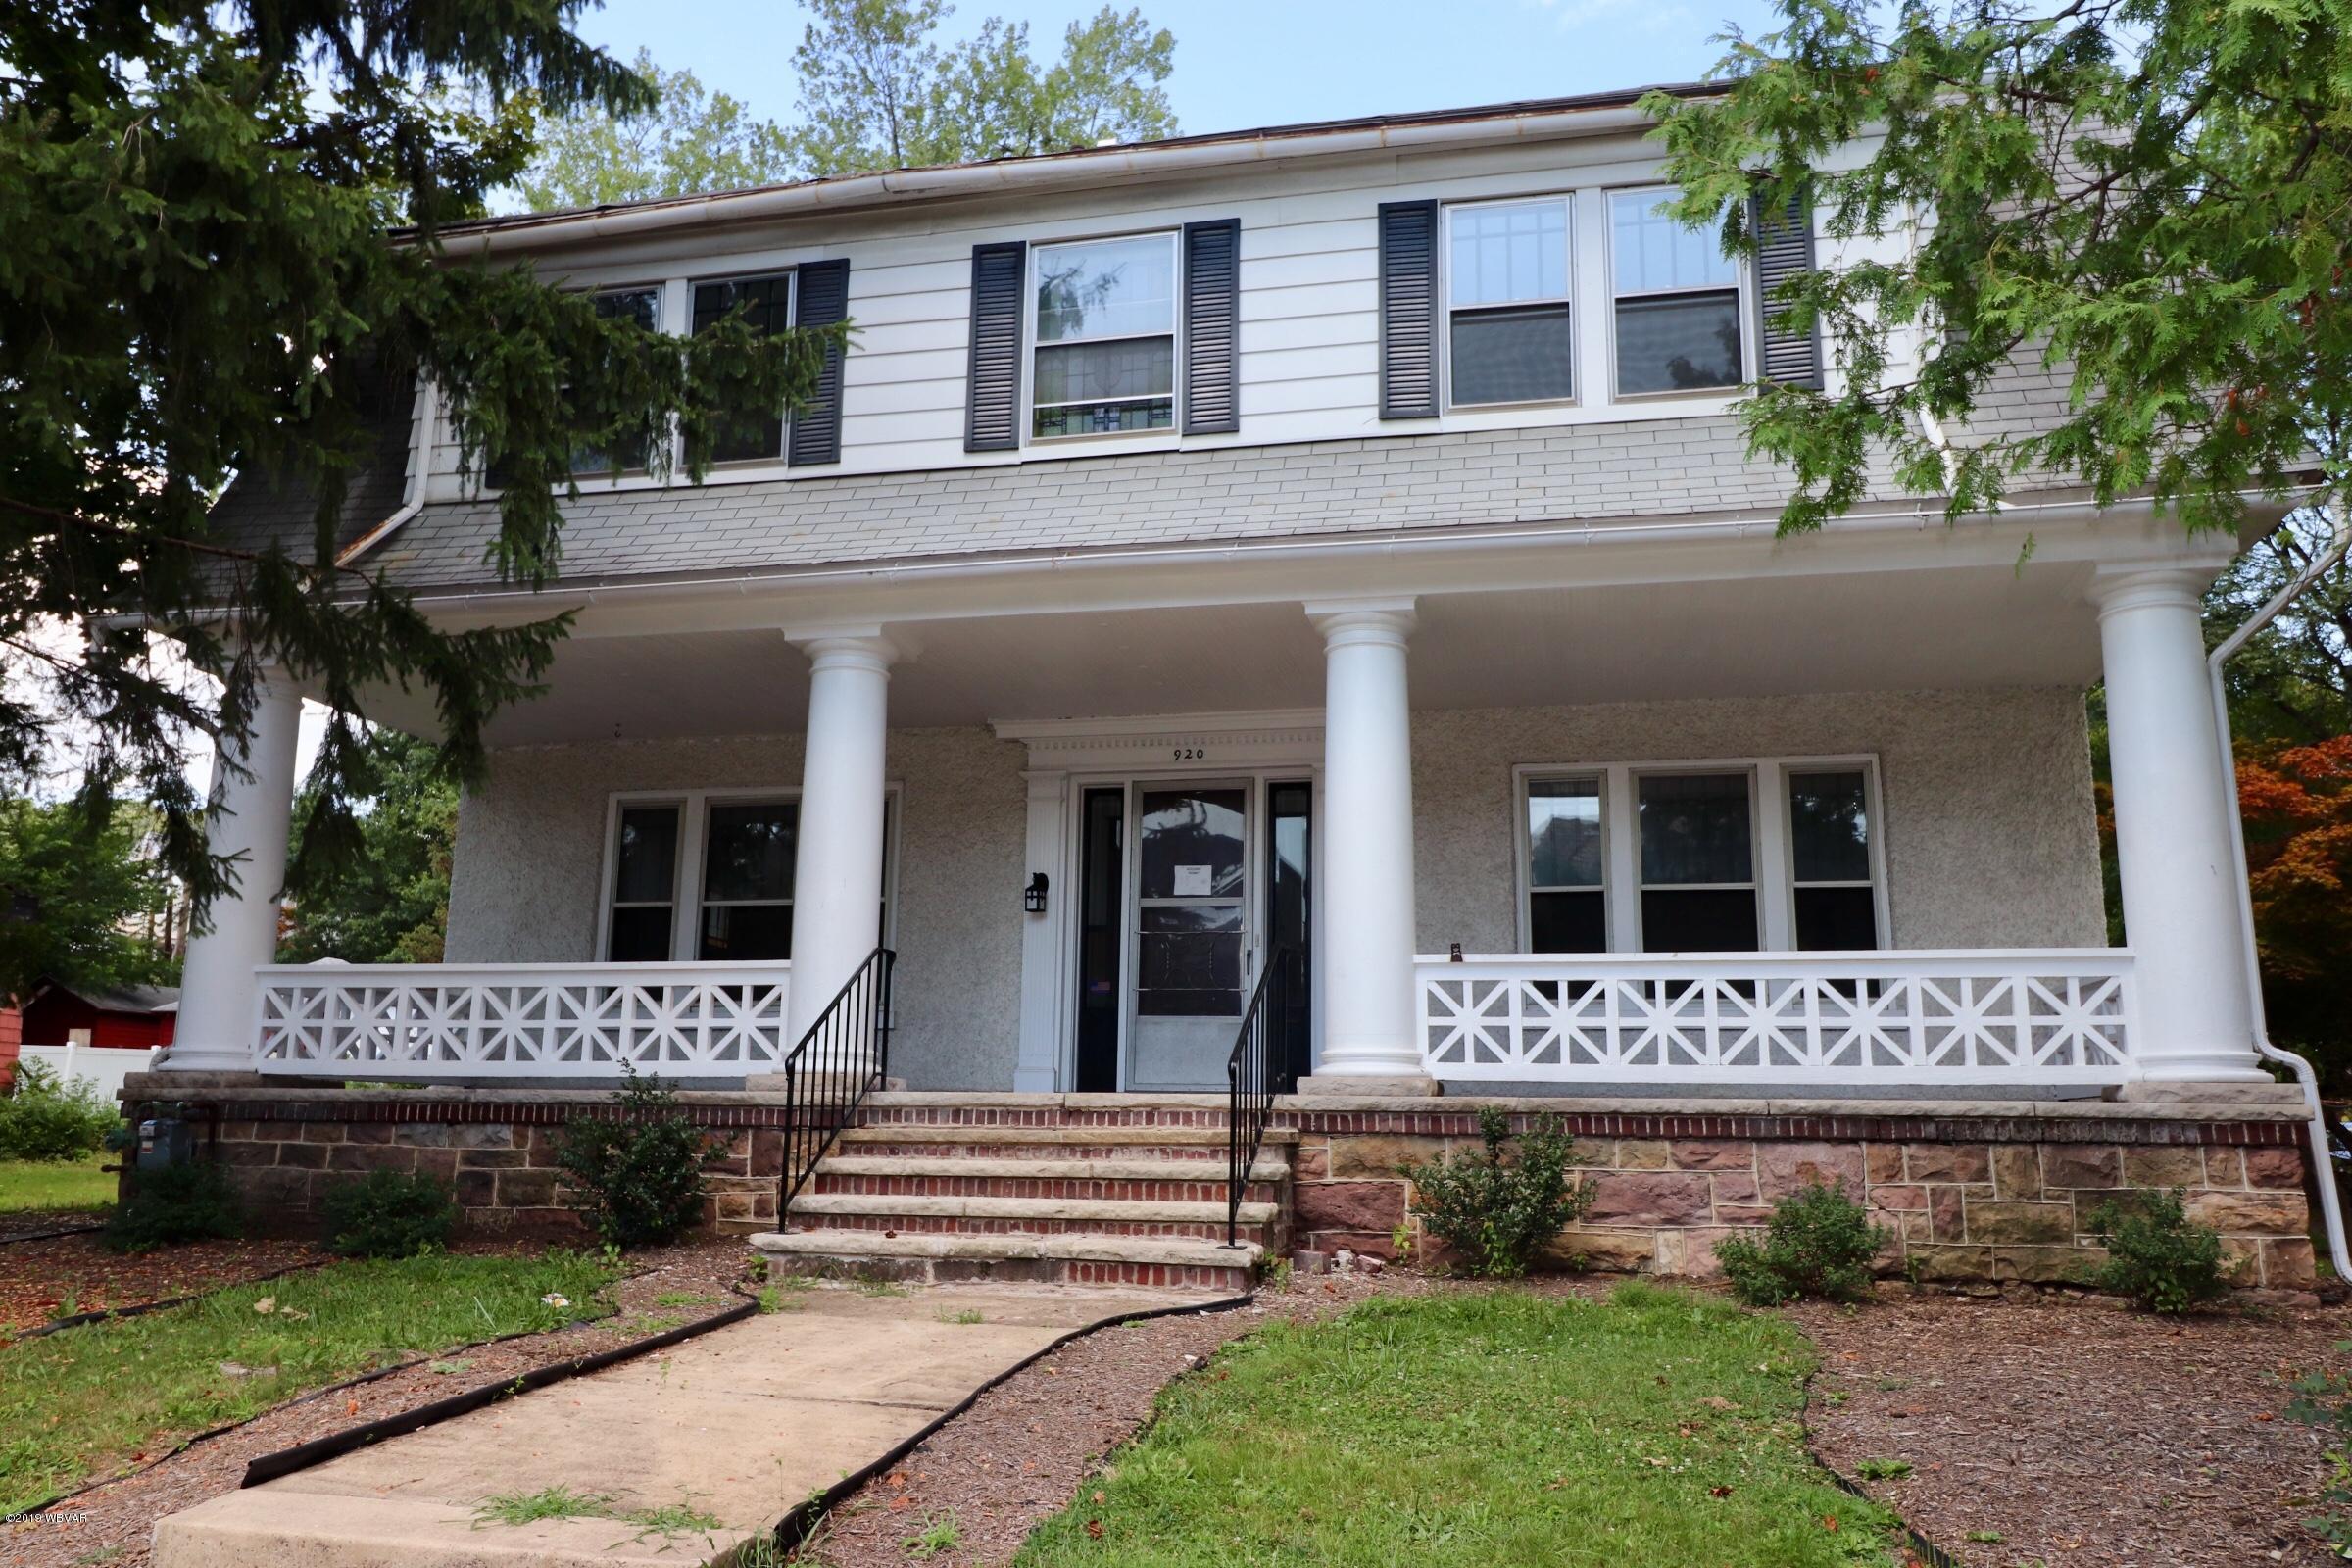 920 HIGH STREET,Williamsport,PA 17701,4 Bedrooms Bedrooms,3 BathroomsBathrooms,Residential,HIGH,WB-88211